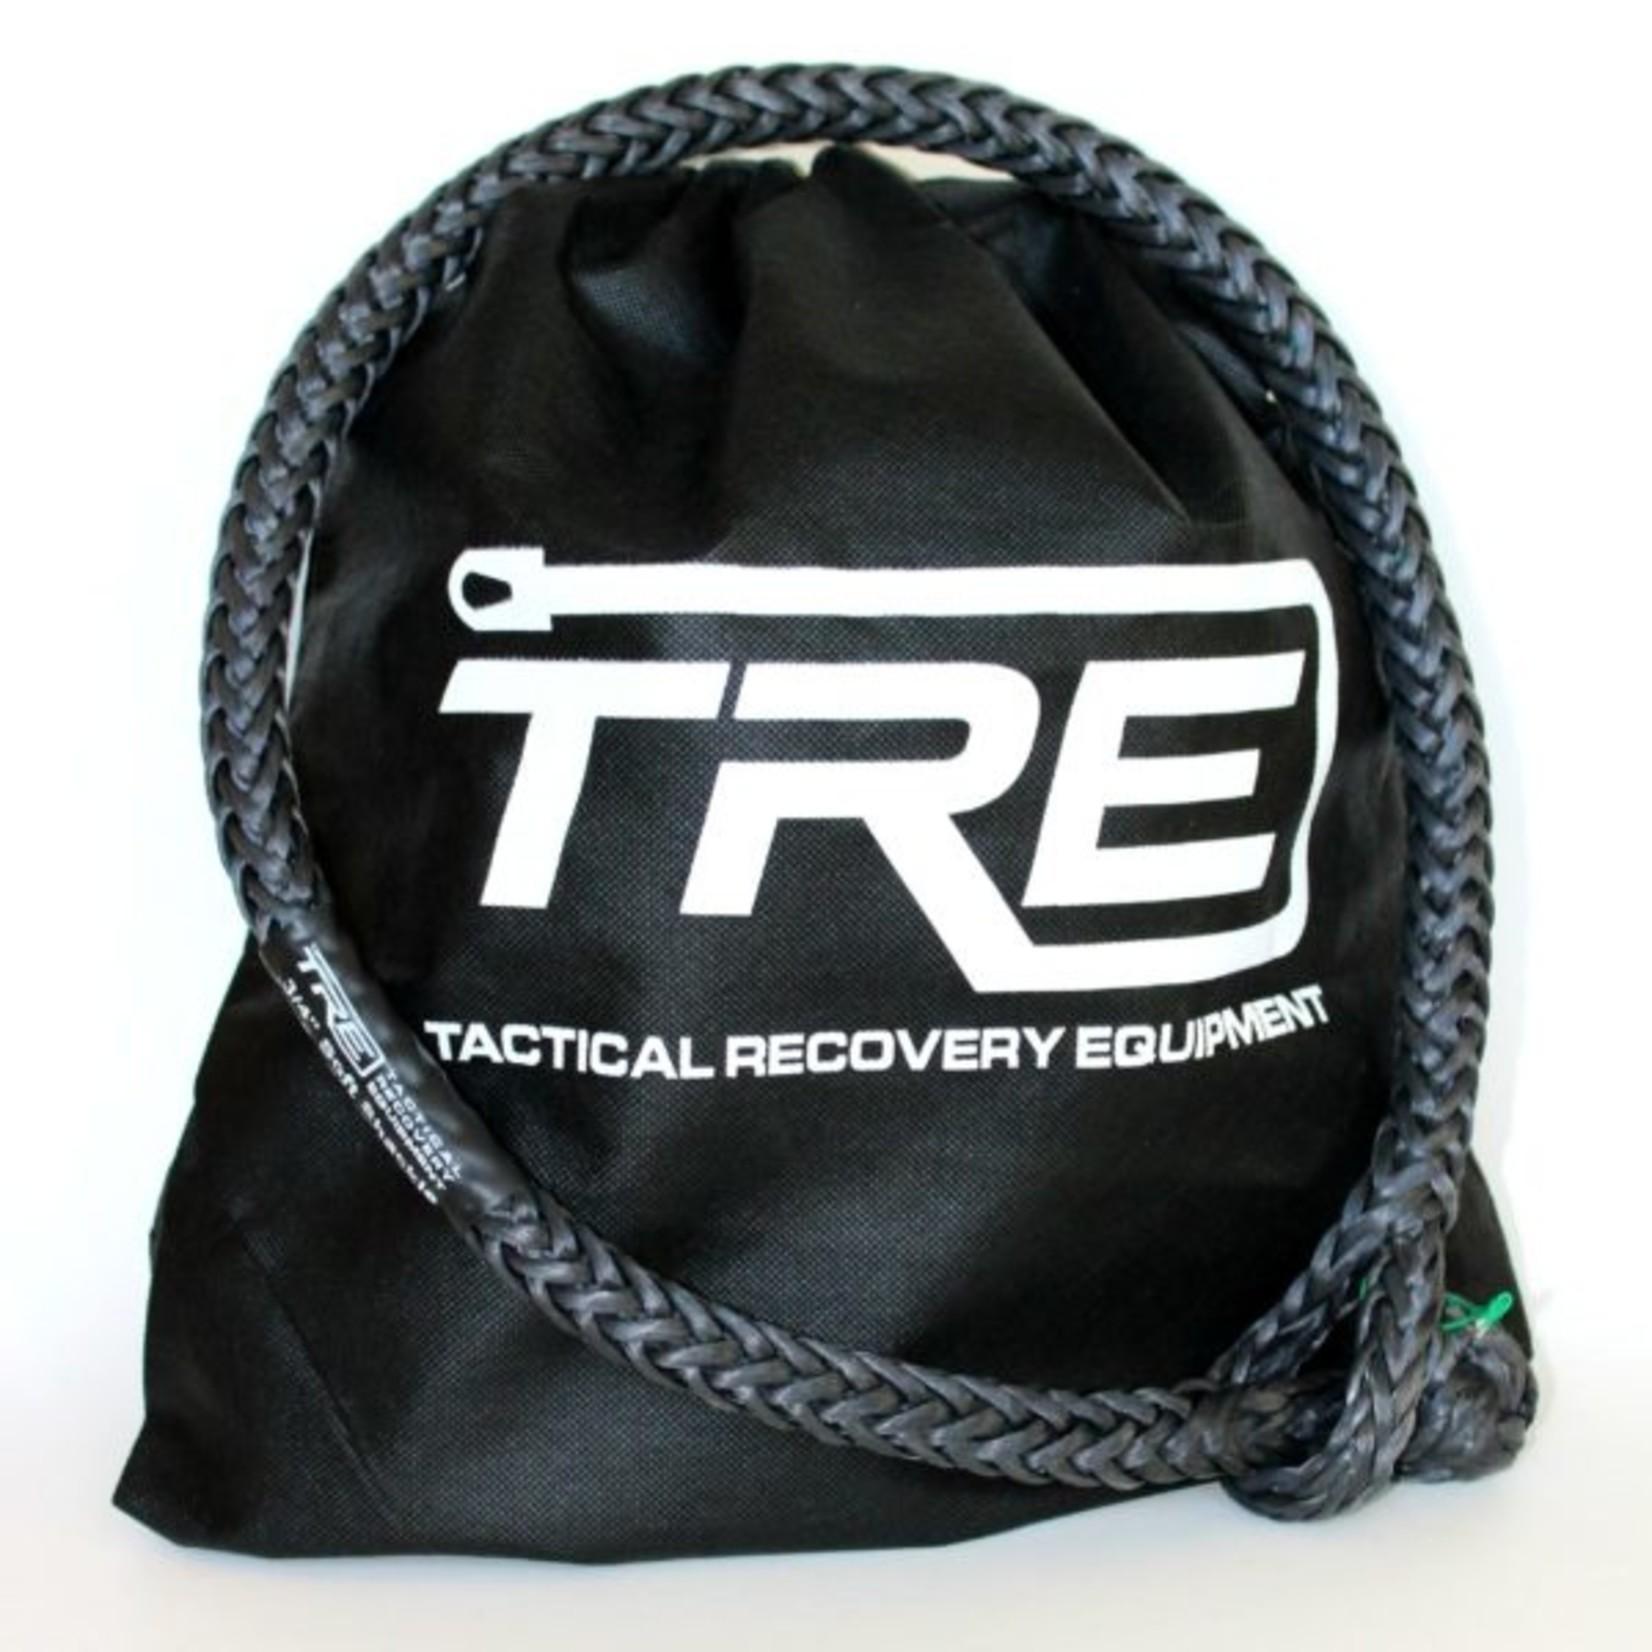 TRE TRE 3/4″ Large Soft Shackles w/Quick Release